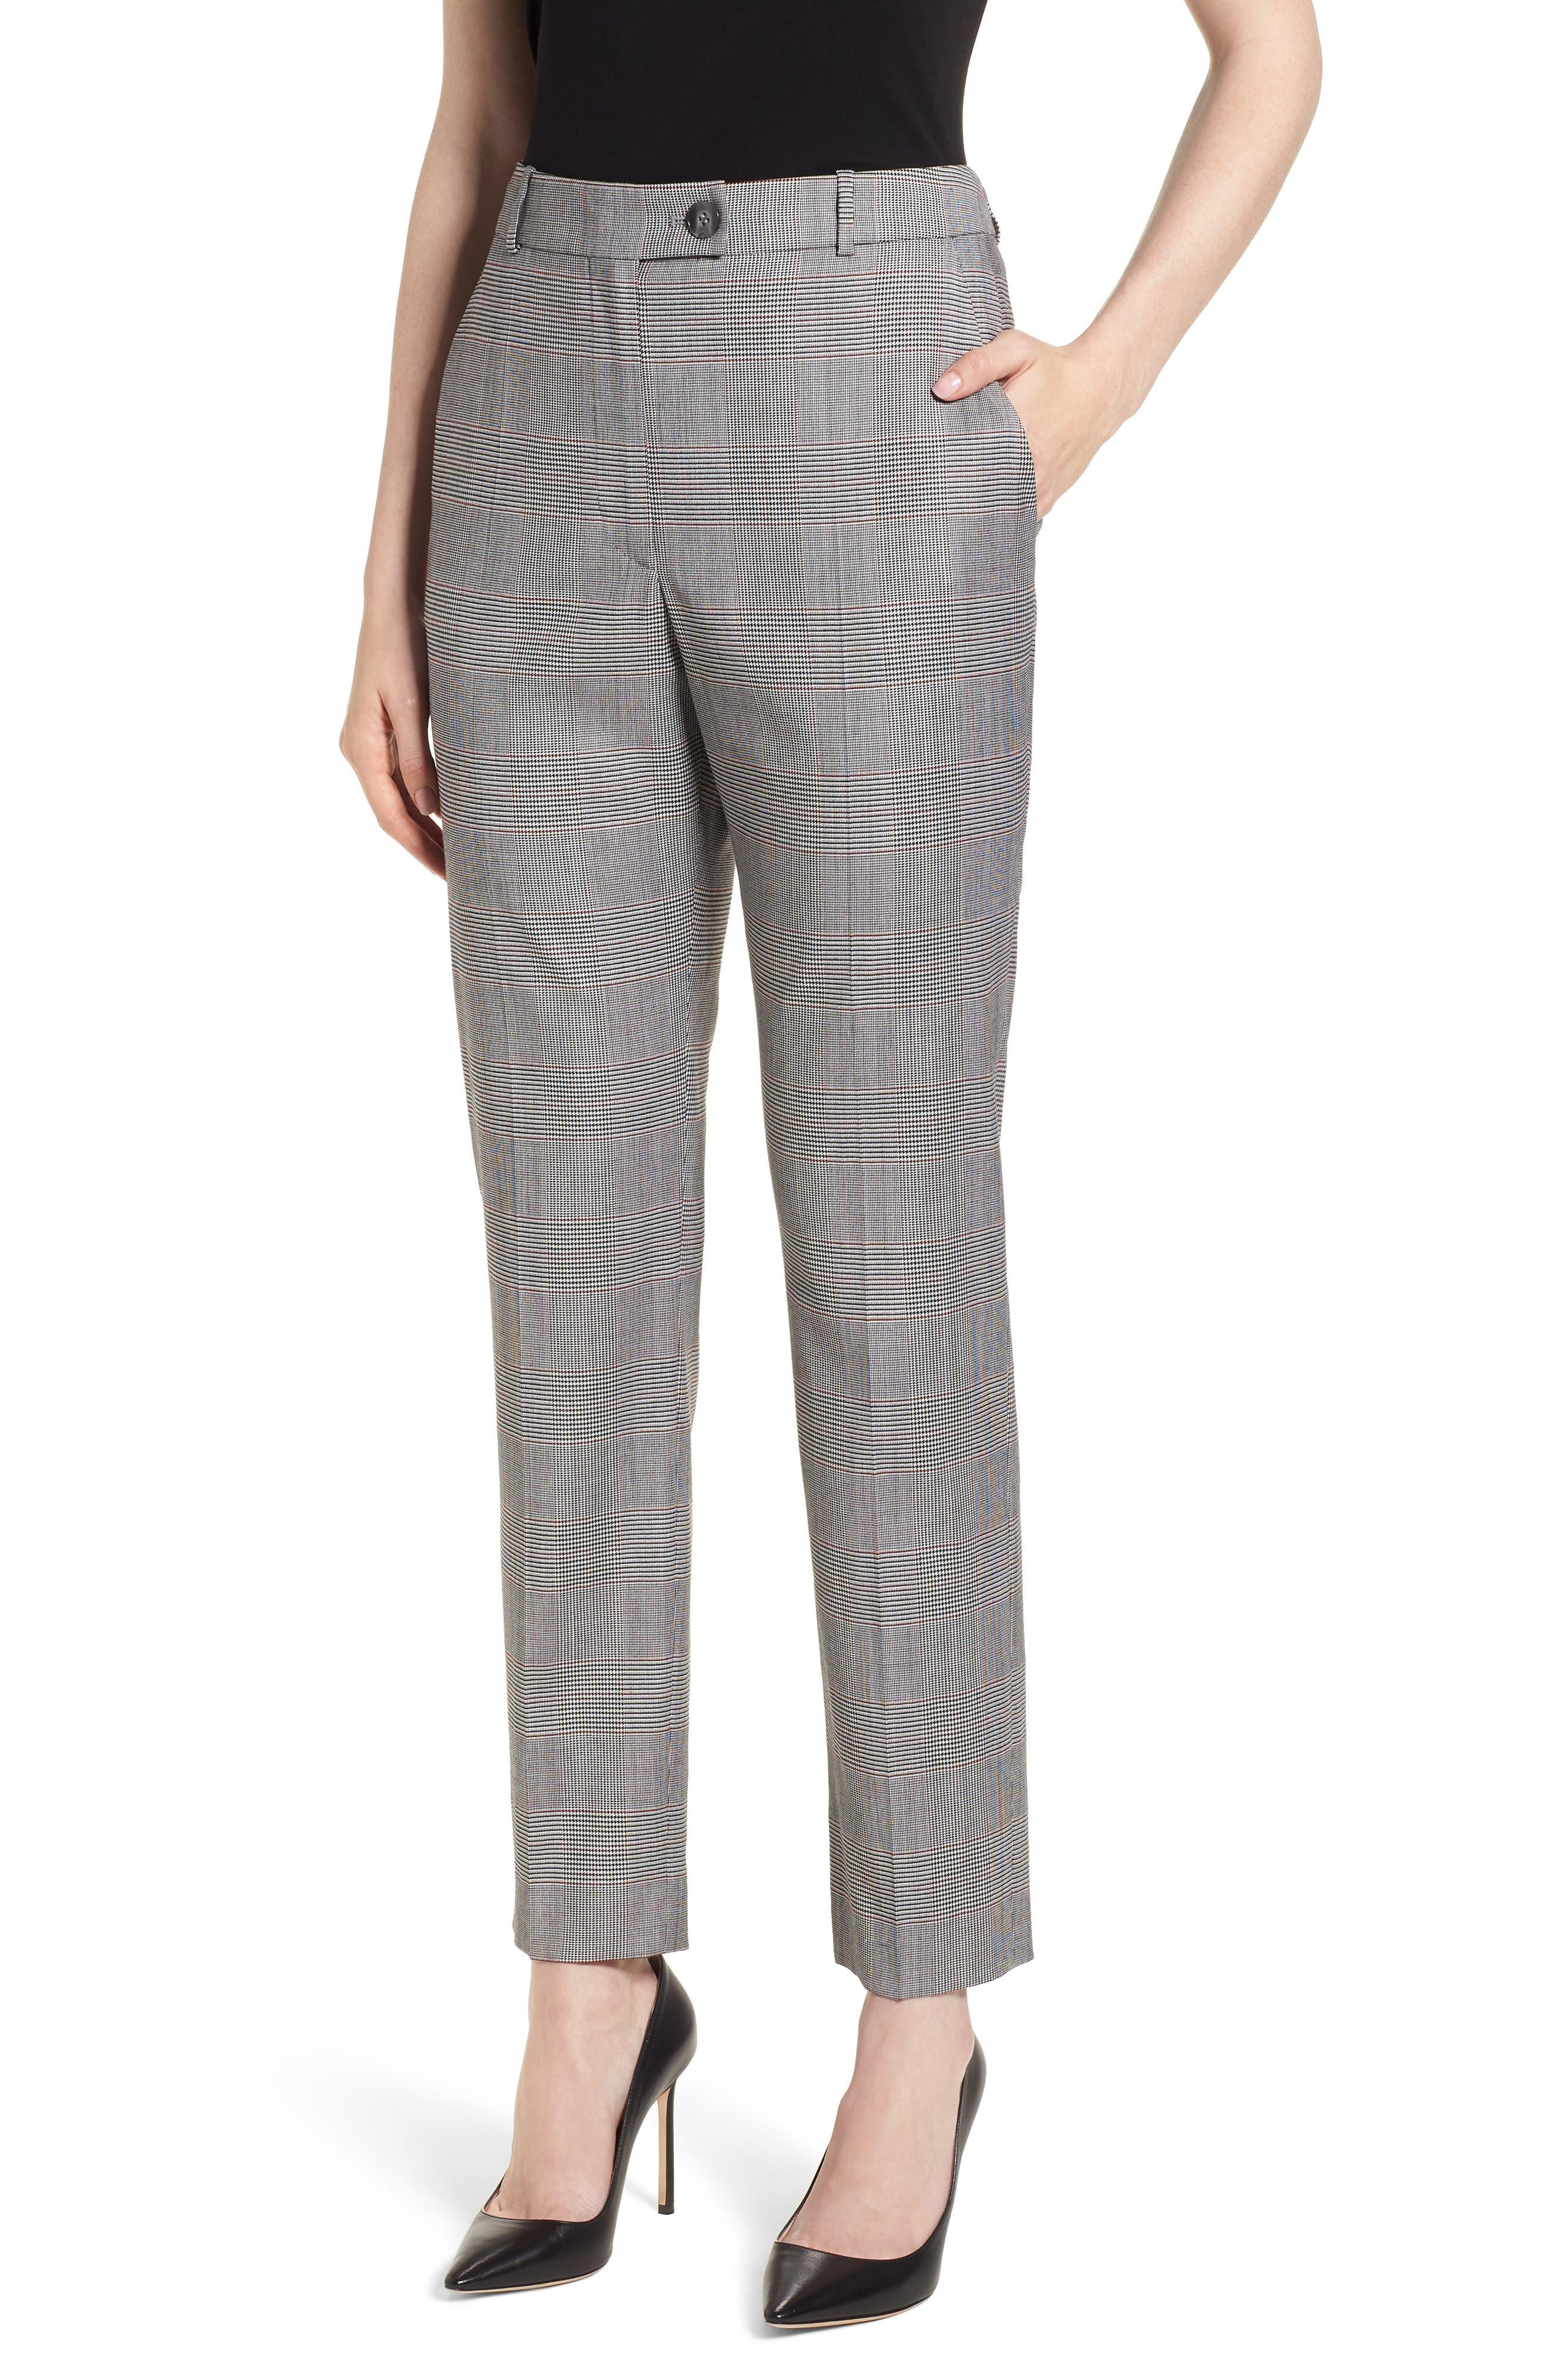 Tofilia Glencheck Slim Fit Trousers,                             Main thumbnail 1, color,                             Dark Sunset Orange Fantasy